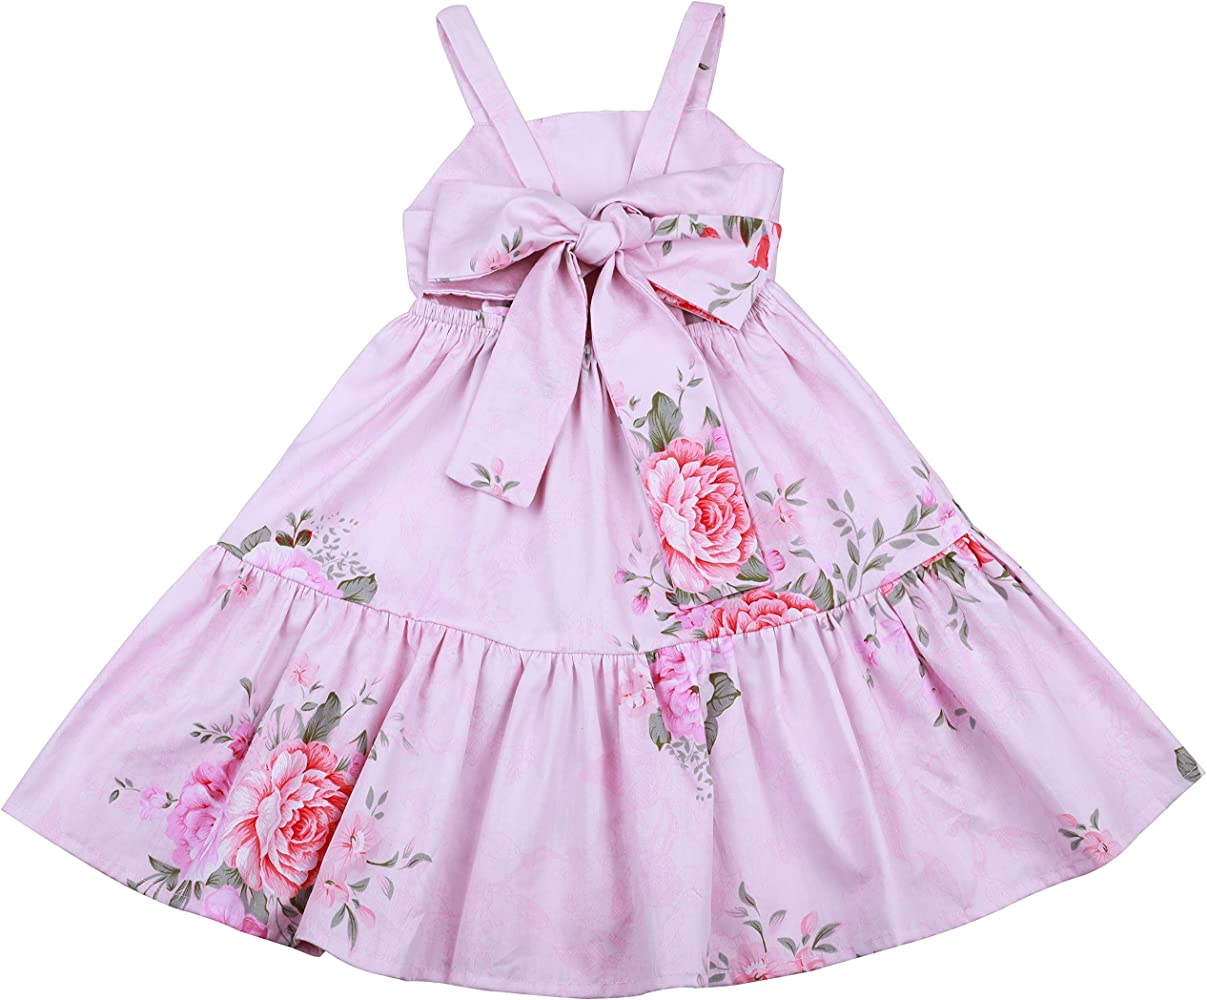 Flofallzique Vintage Floral Summer Girl Dress Easter Cotton Casual Toddler Party Sundress